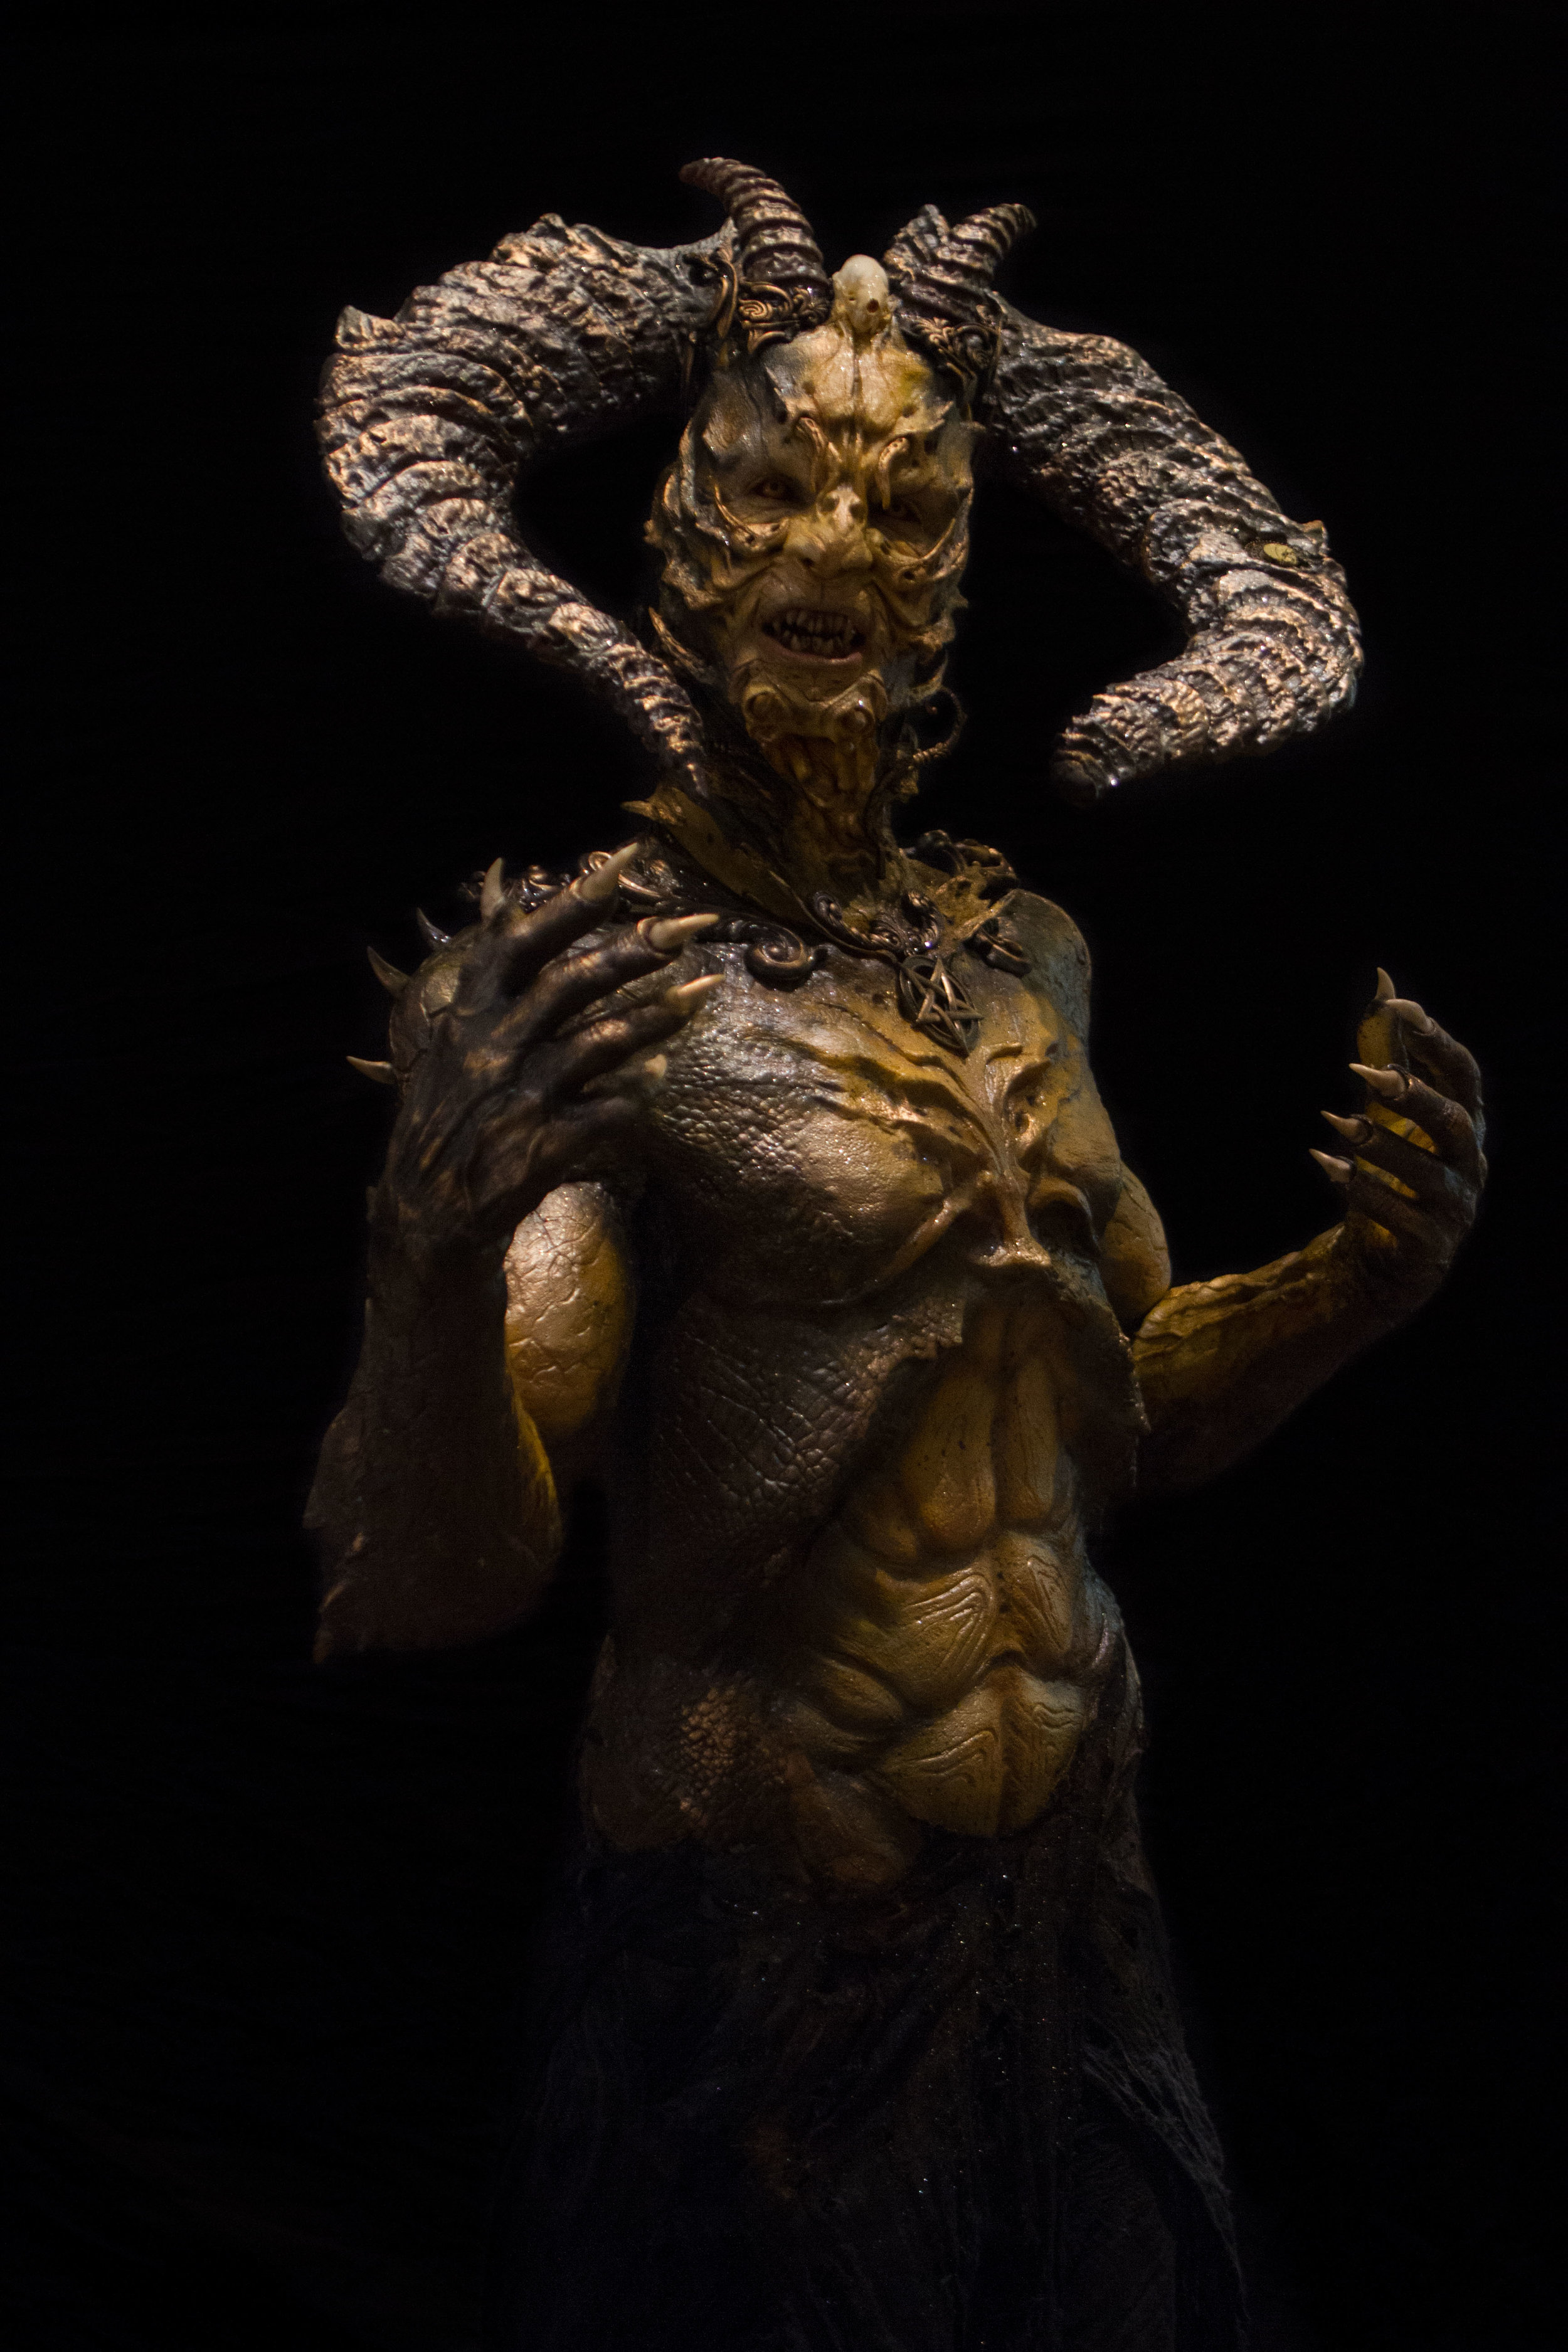 Nomen Illis Legio demon (special effects by FX Creator (Vlad Taupesh & Josef Rarach) Photo by KyleReaPhotography.com)